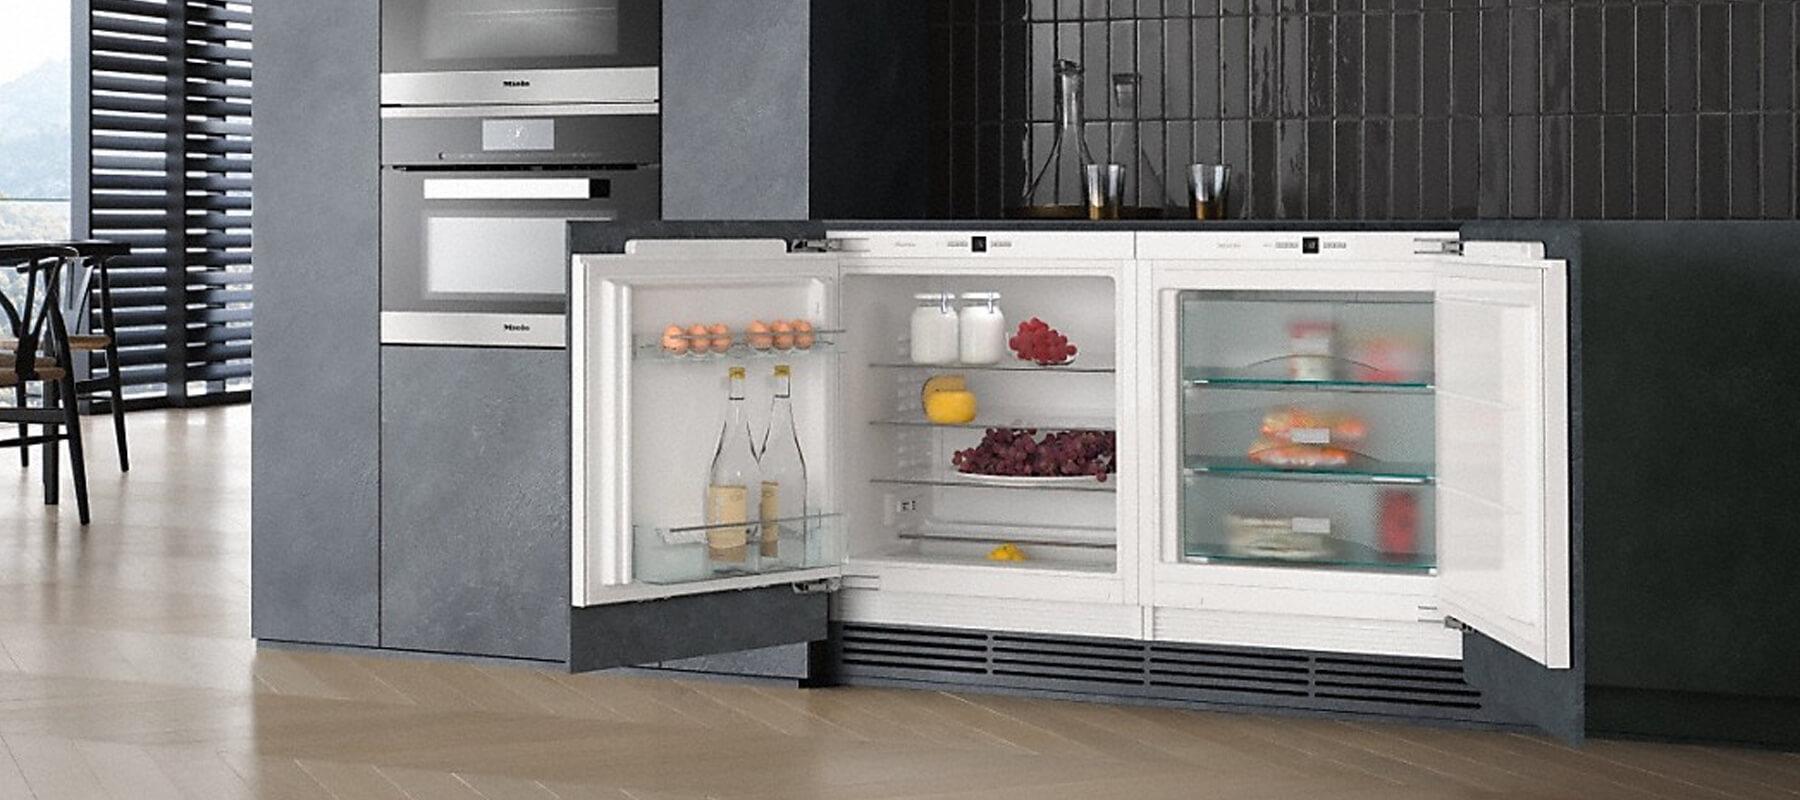 Built in Counter Depth Refrigerator La Quinta   Built-in Refrigerator Repair